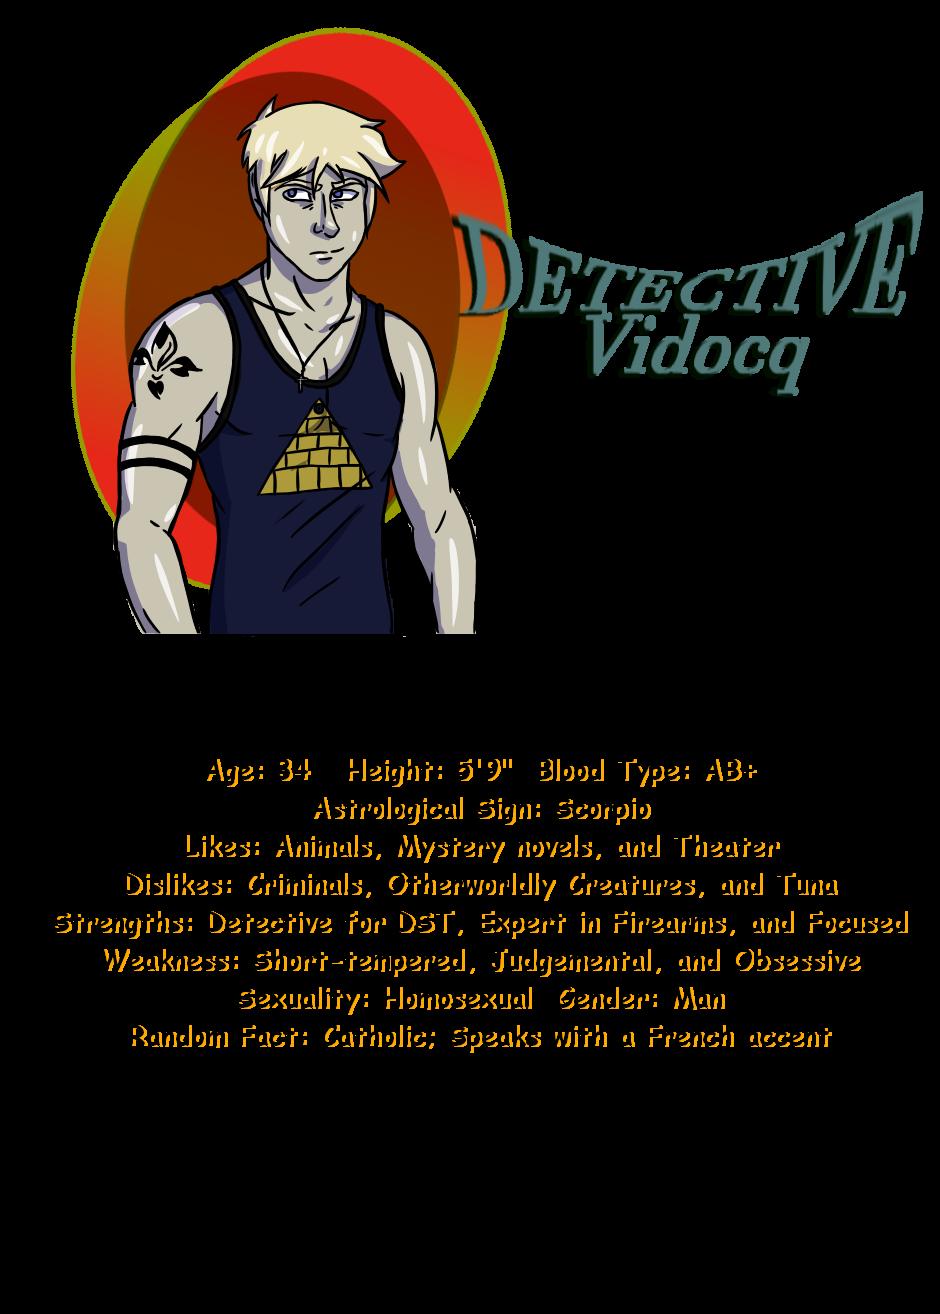 Character Introduction Vidocq